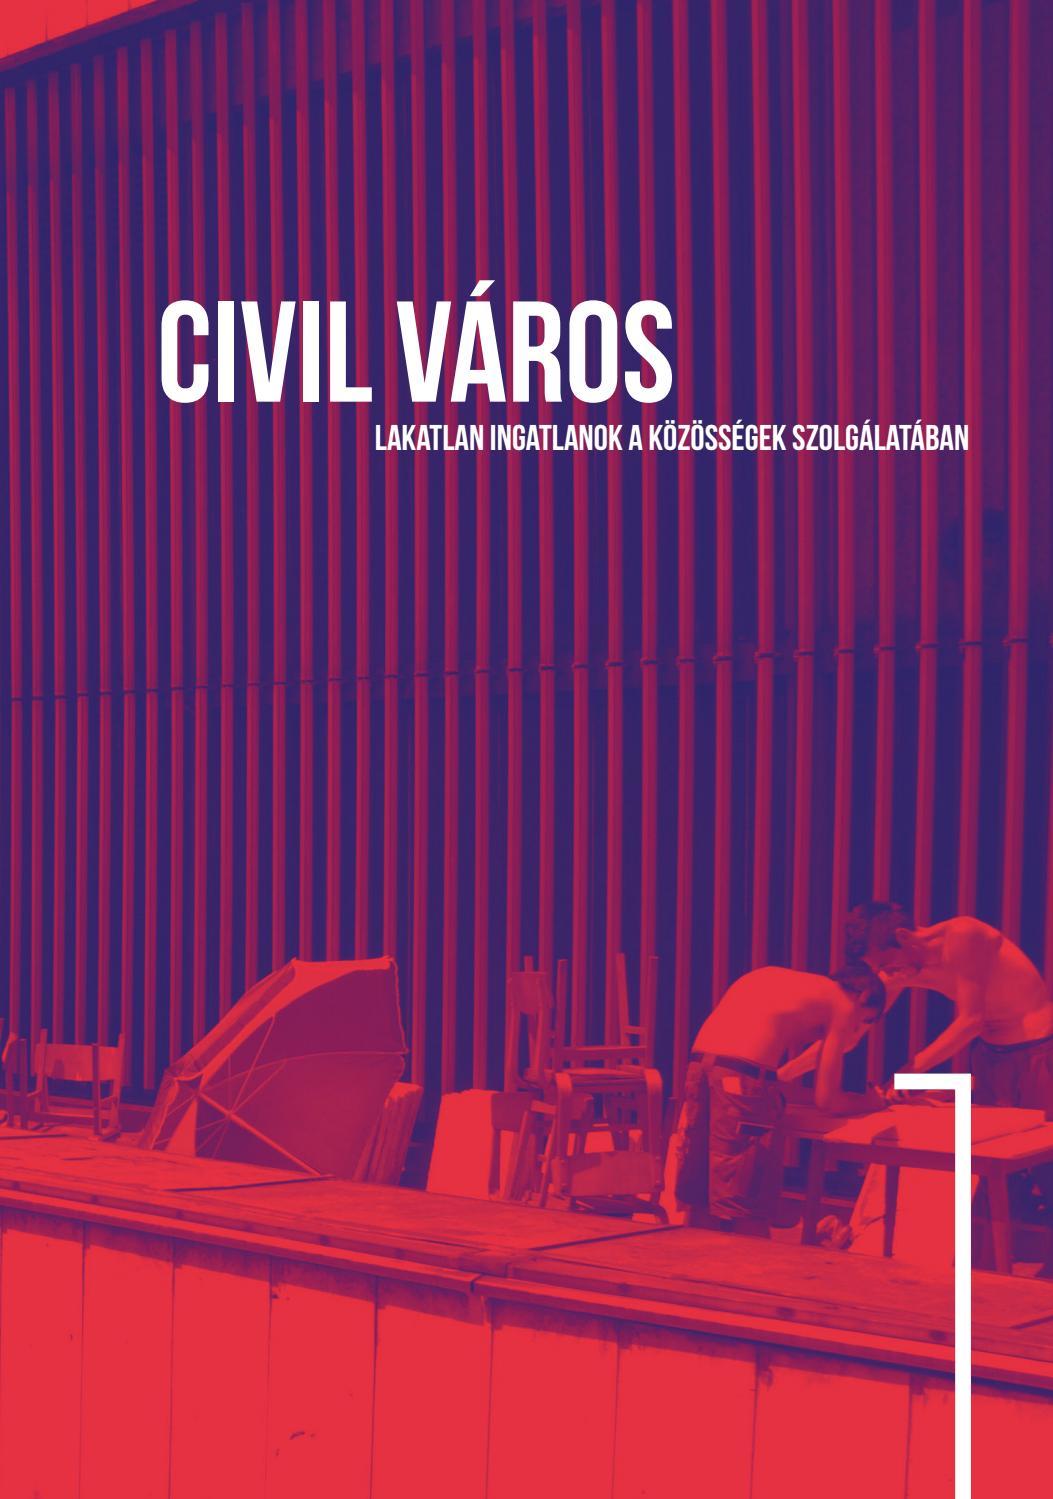 Nem kell mar sokaig jarkalnunk 71 - Civil V Ros Lakatlan Ingatlanok A K Z Ss Gek Szolg Lat Ban By K K Hungarian Contemporary Architecture Centre Issuu